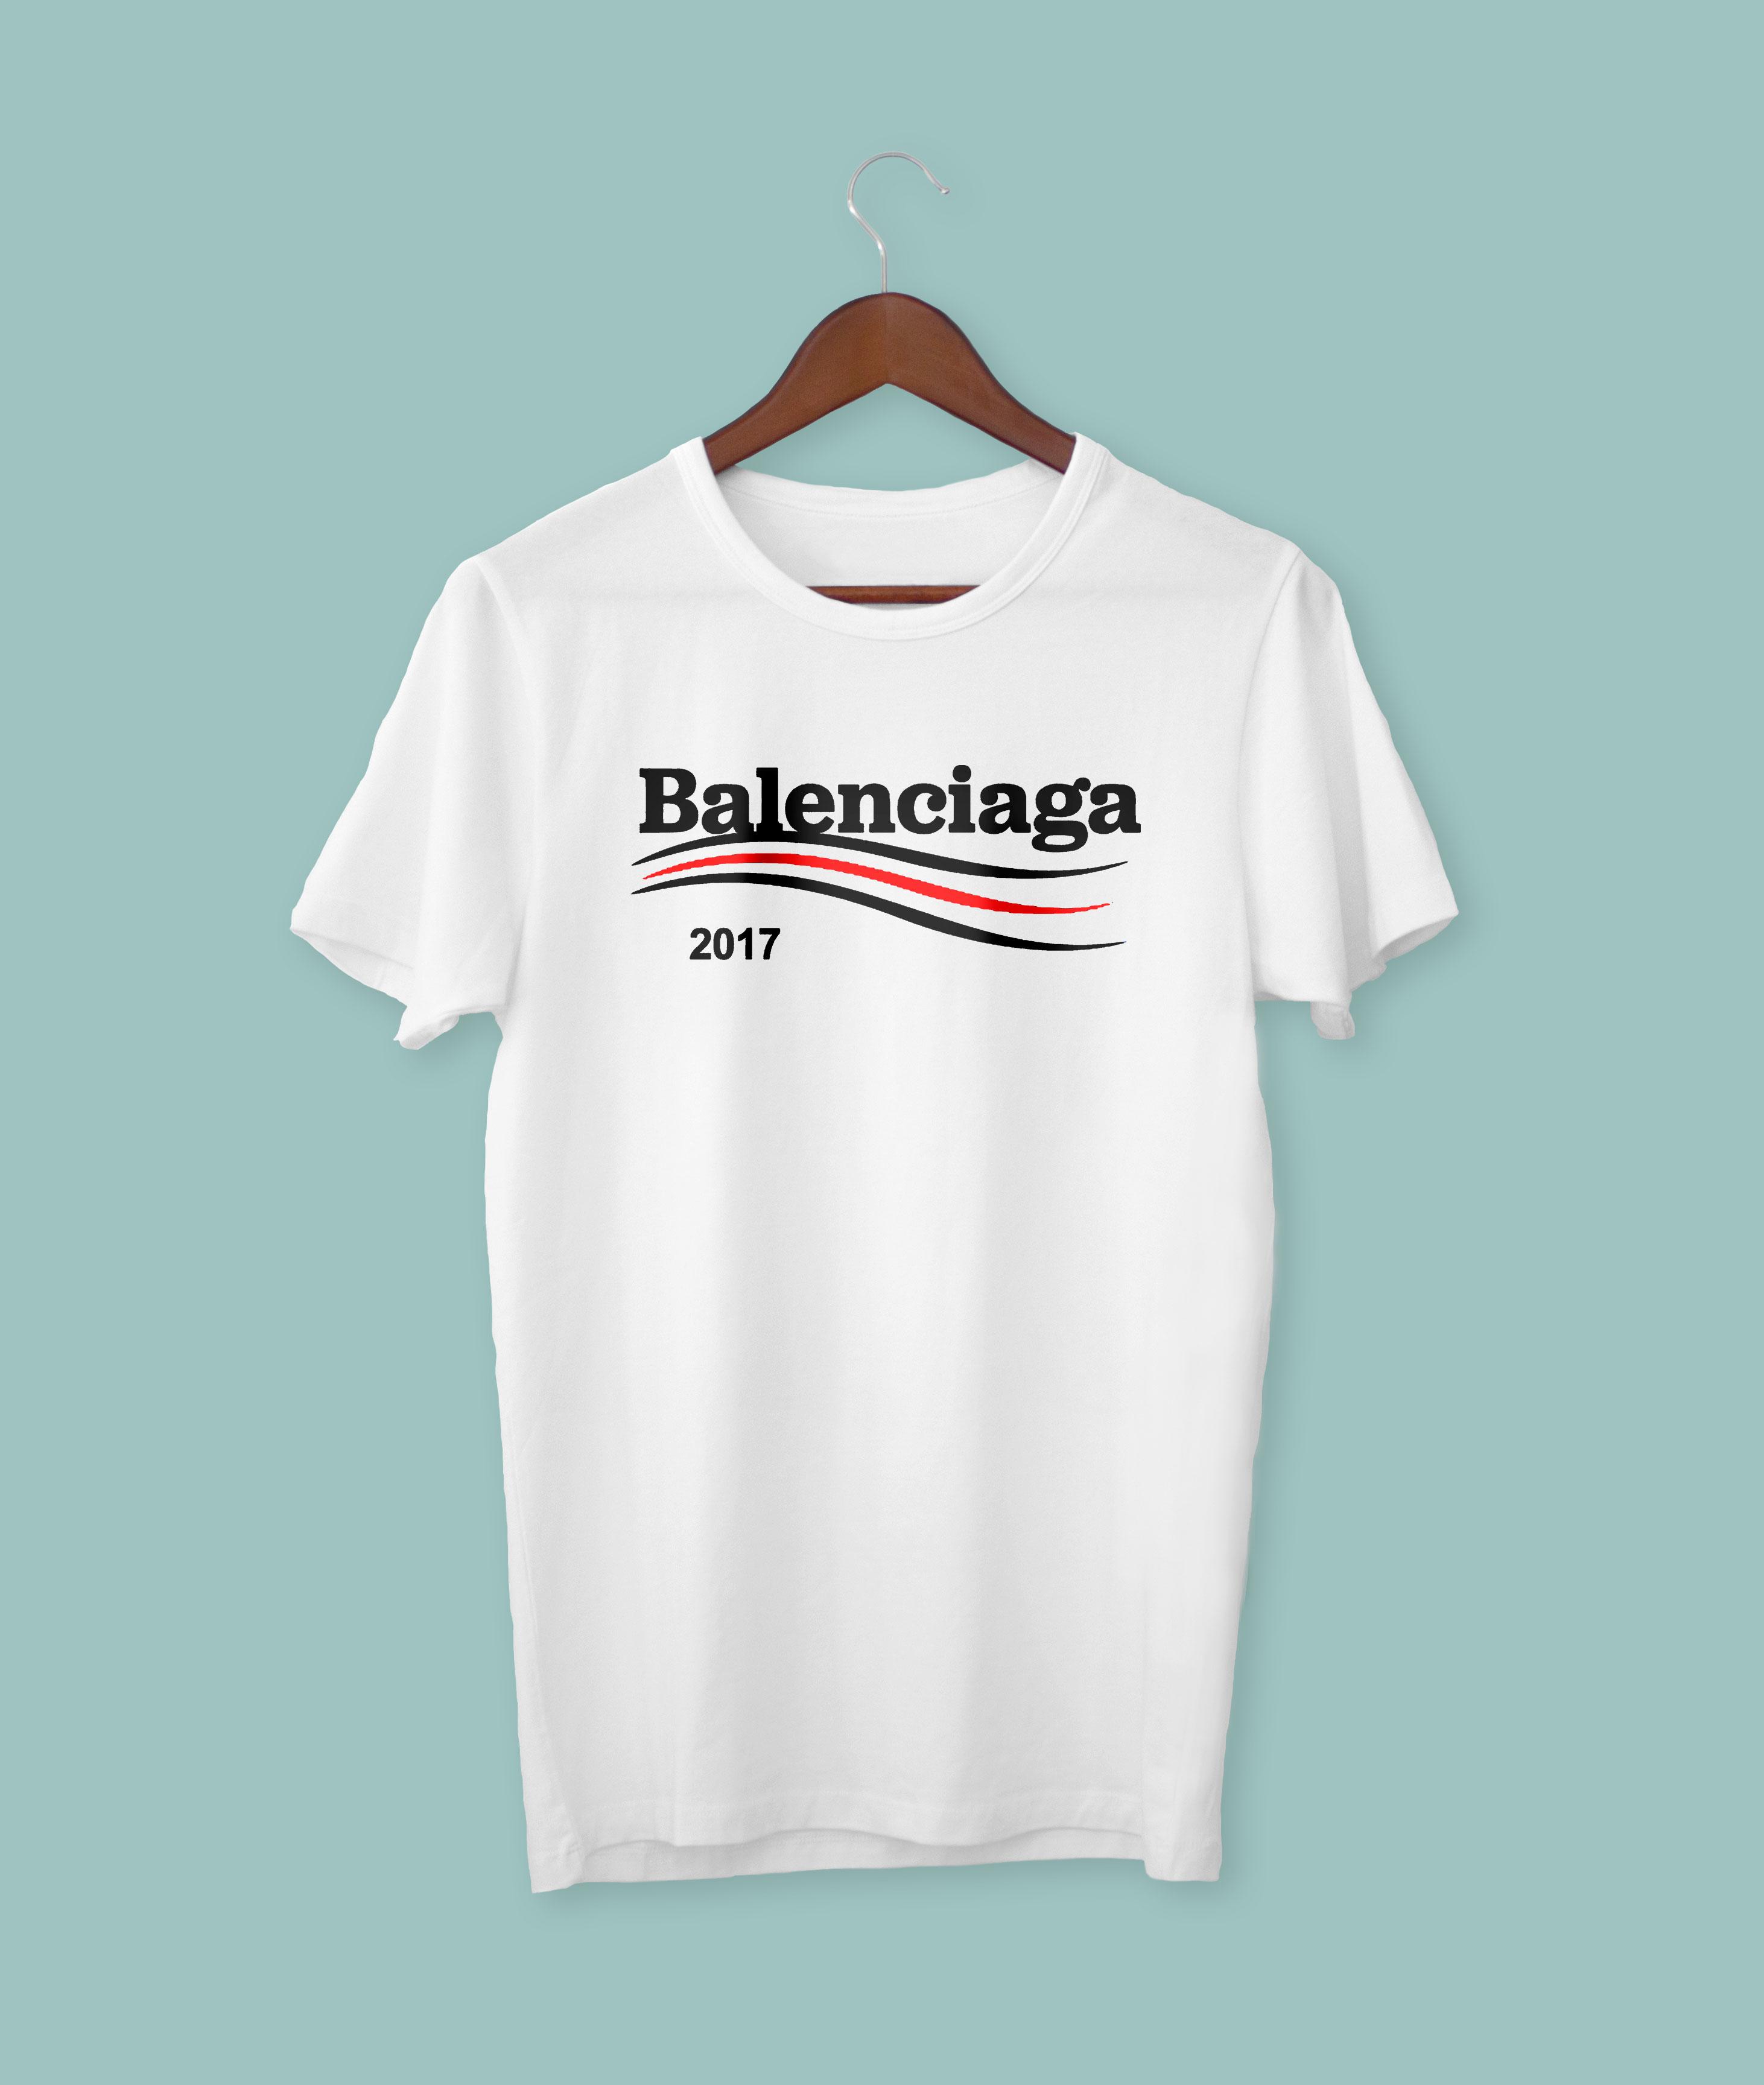 7e43fac76ff4 Balenciaga #3 Shirt Regular Tshirt Tee White Black Gildan on Storenvy